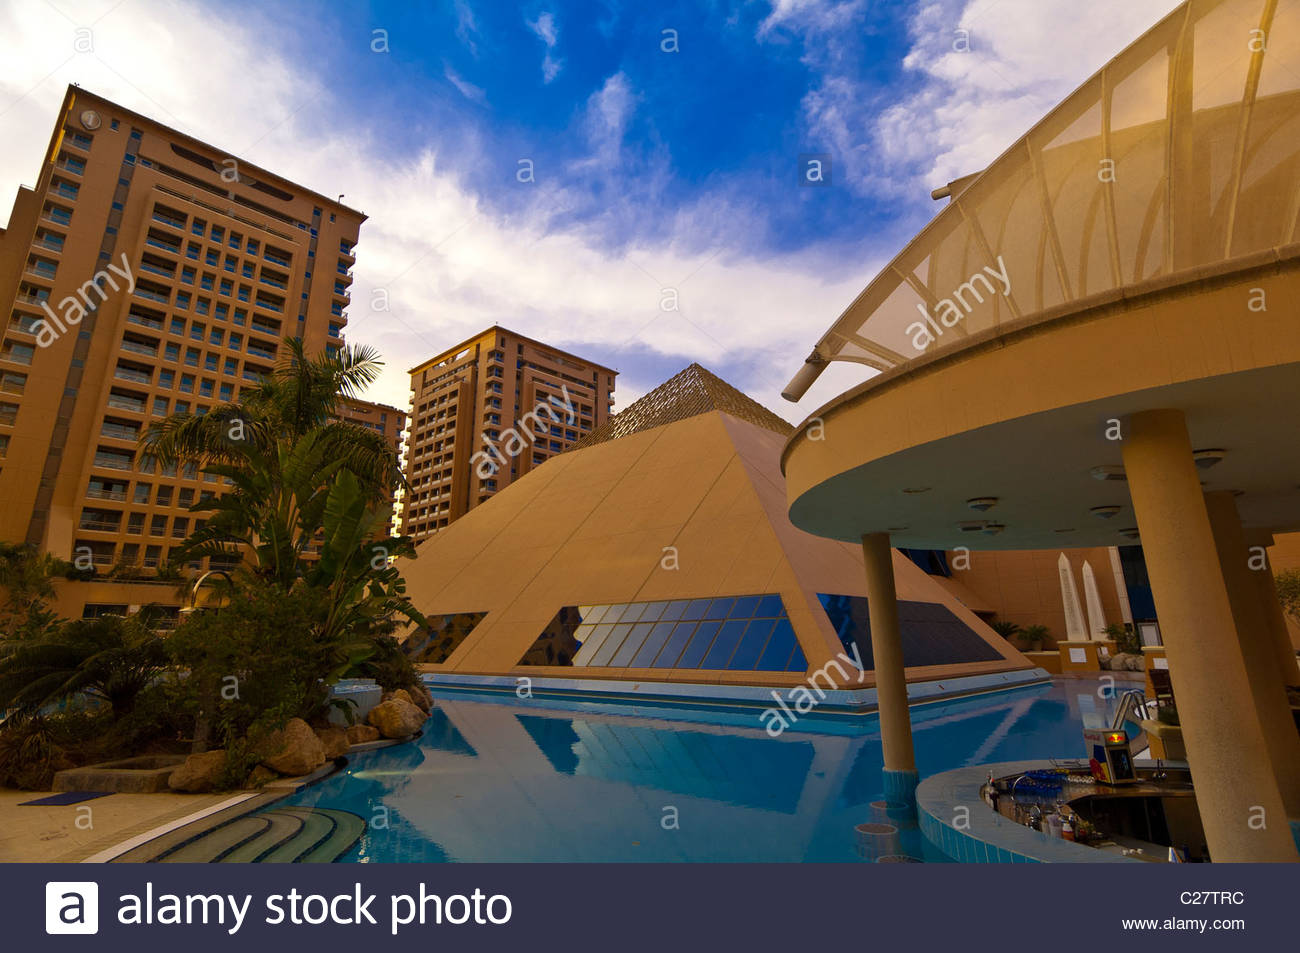 Swimming Pool Intercontinental Cairo City Stars Hotel Cairo Egypt Stock Photo Royalty Free